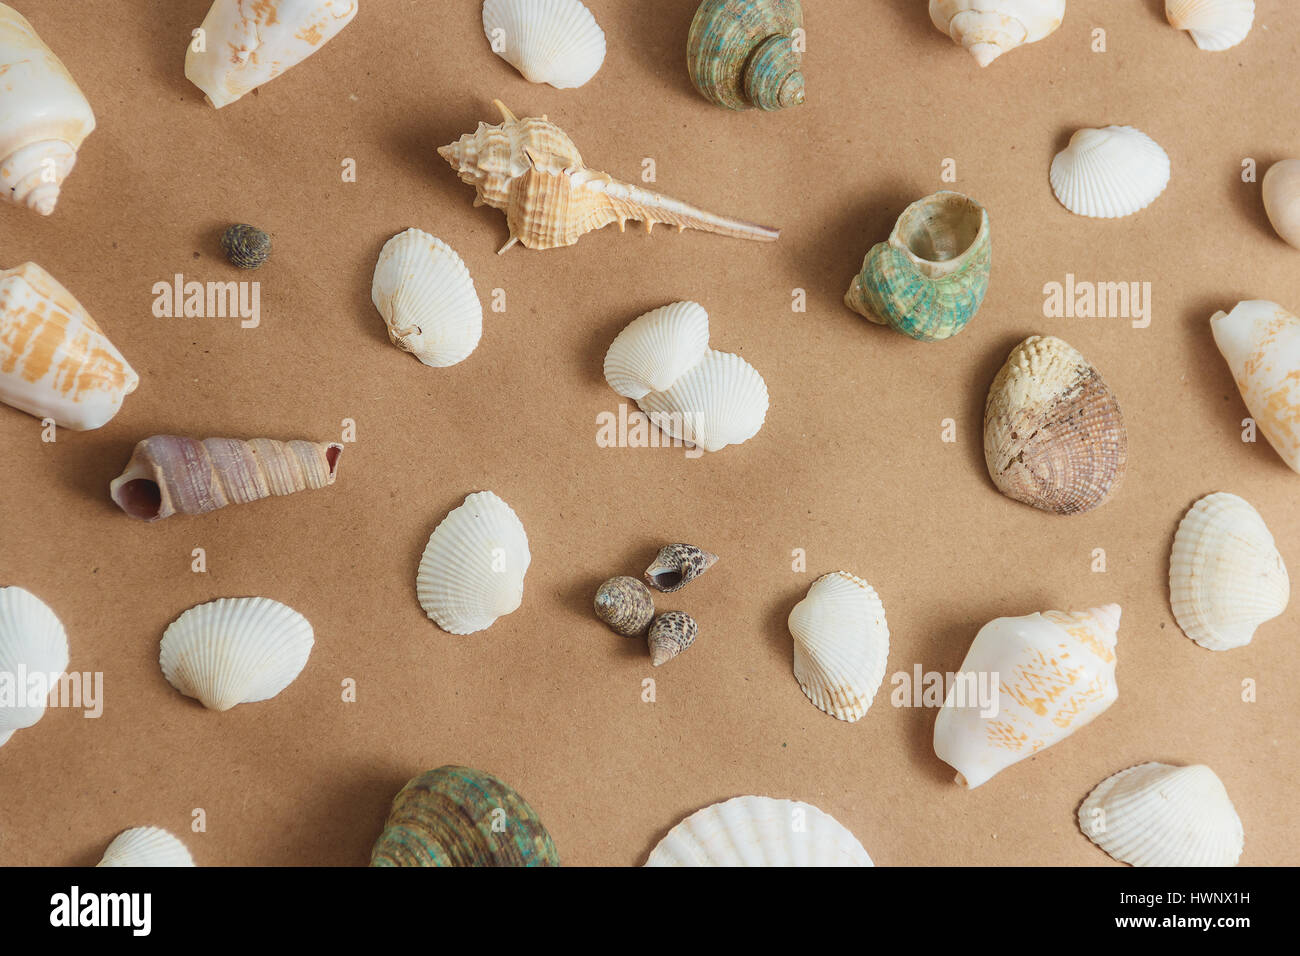 seashells on light background. flat view - Stock Image